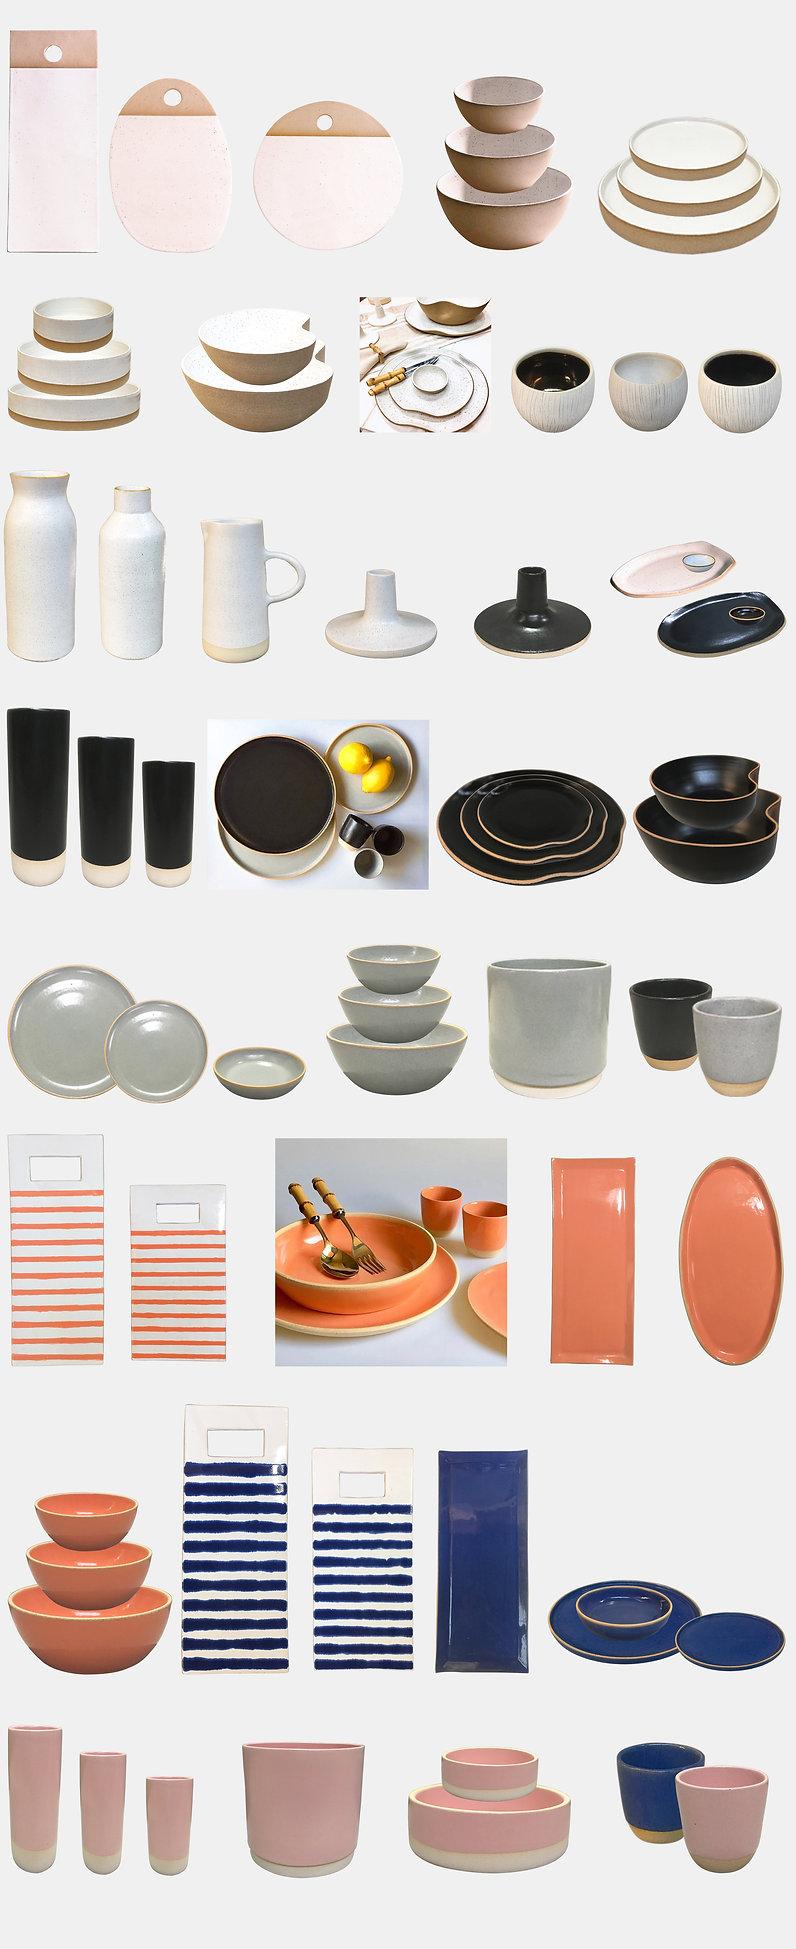 catalogo 2020 ceramica.jpg